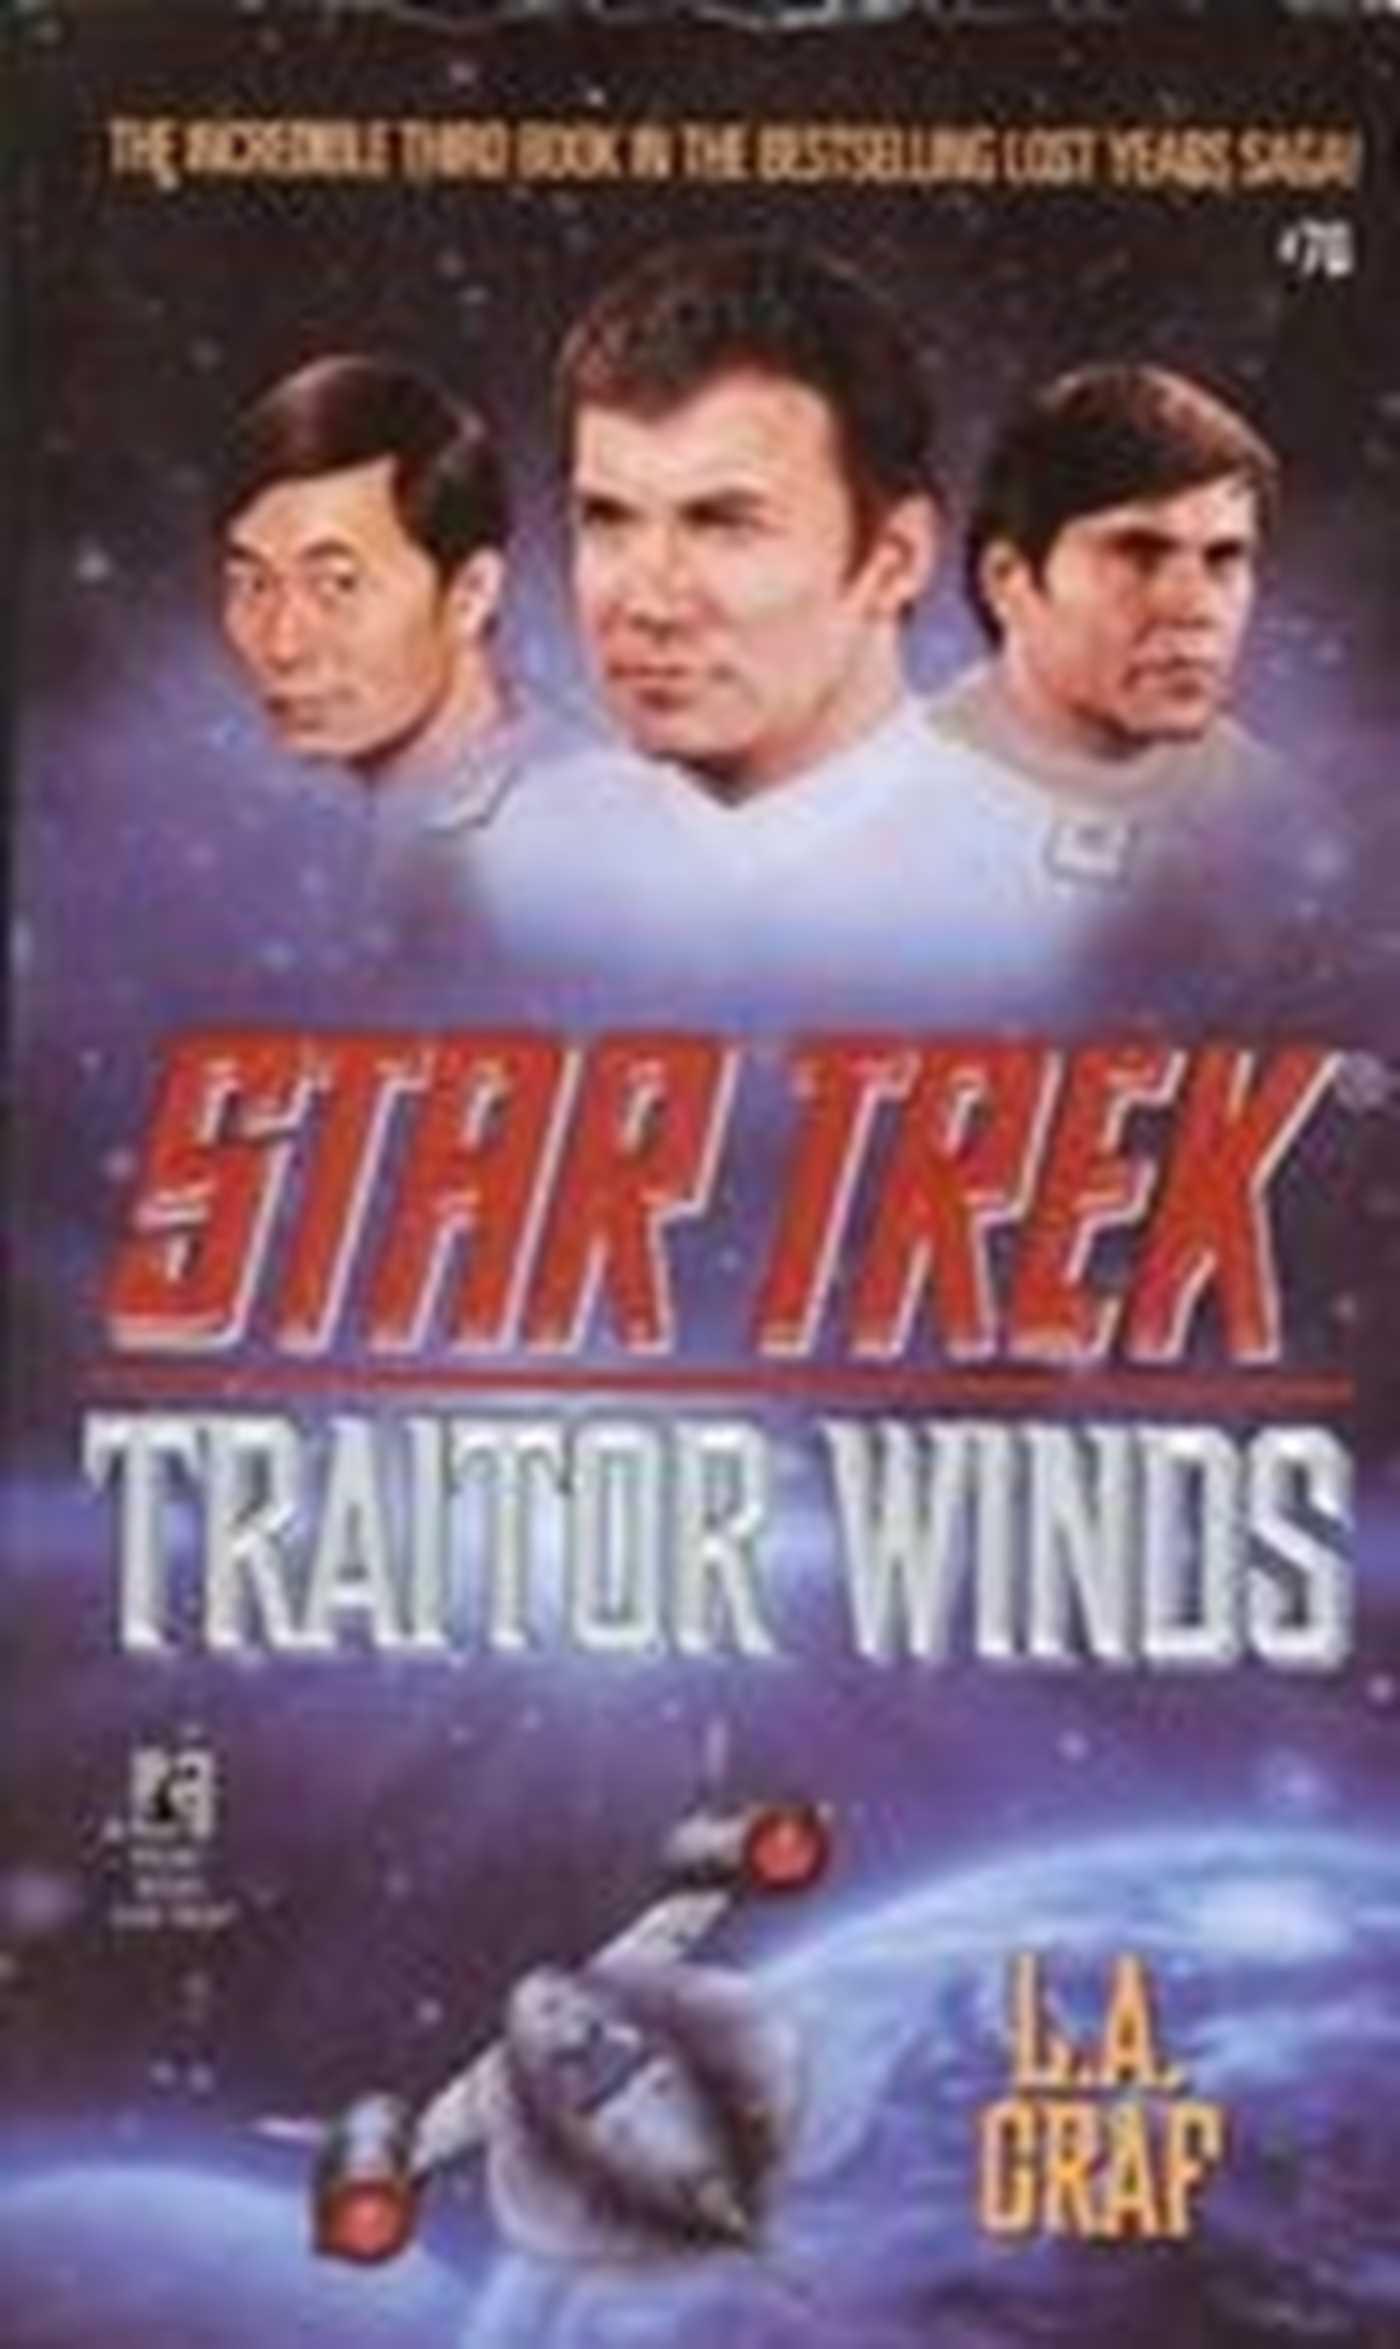 Traitor winds 9780743420211 hr